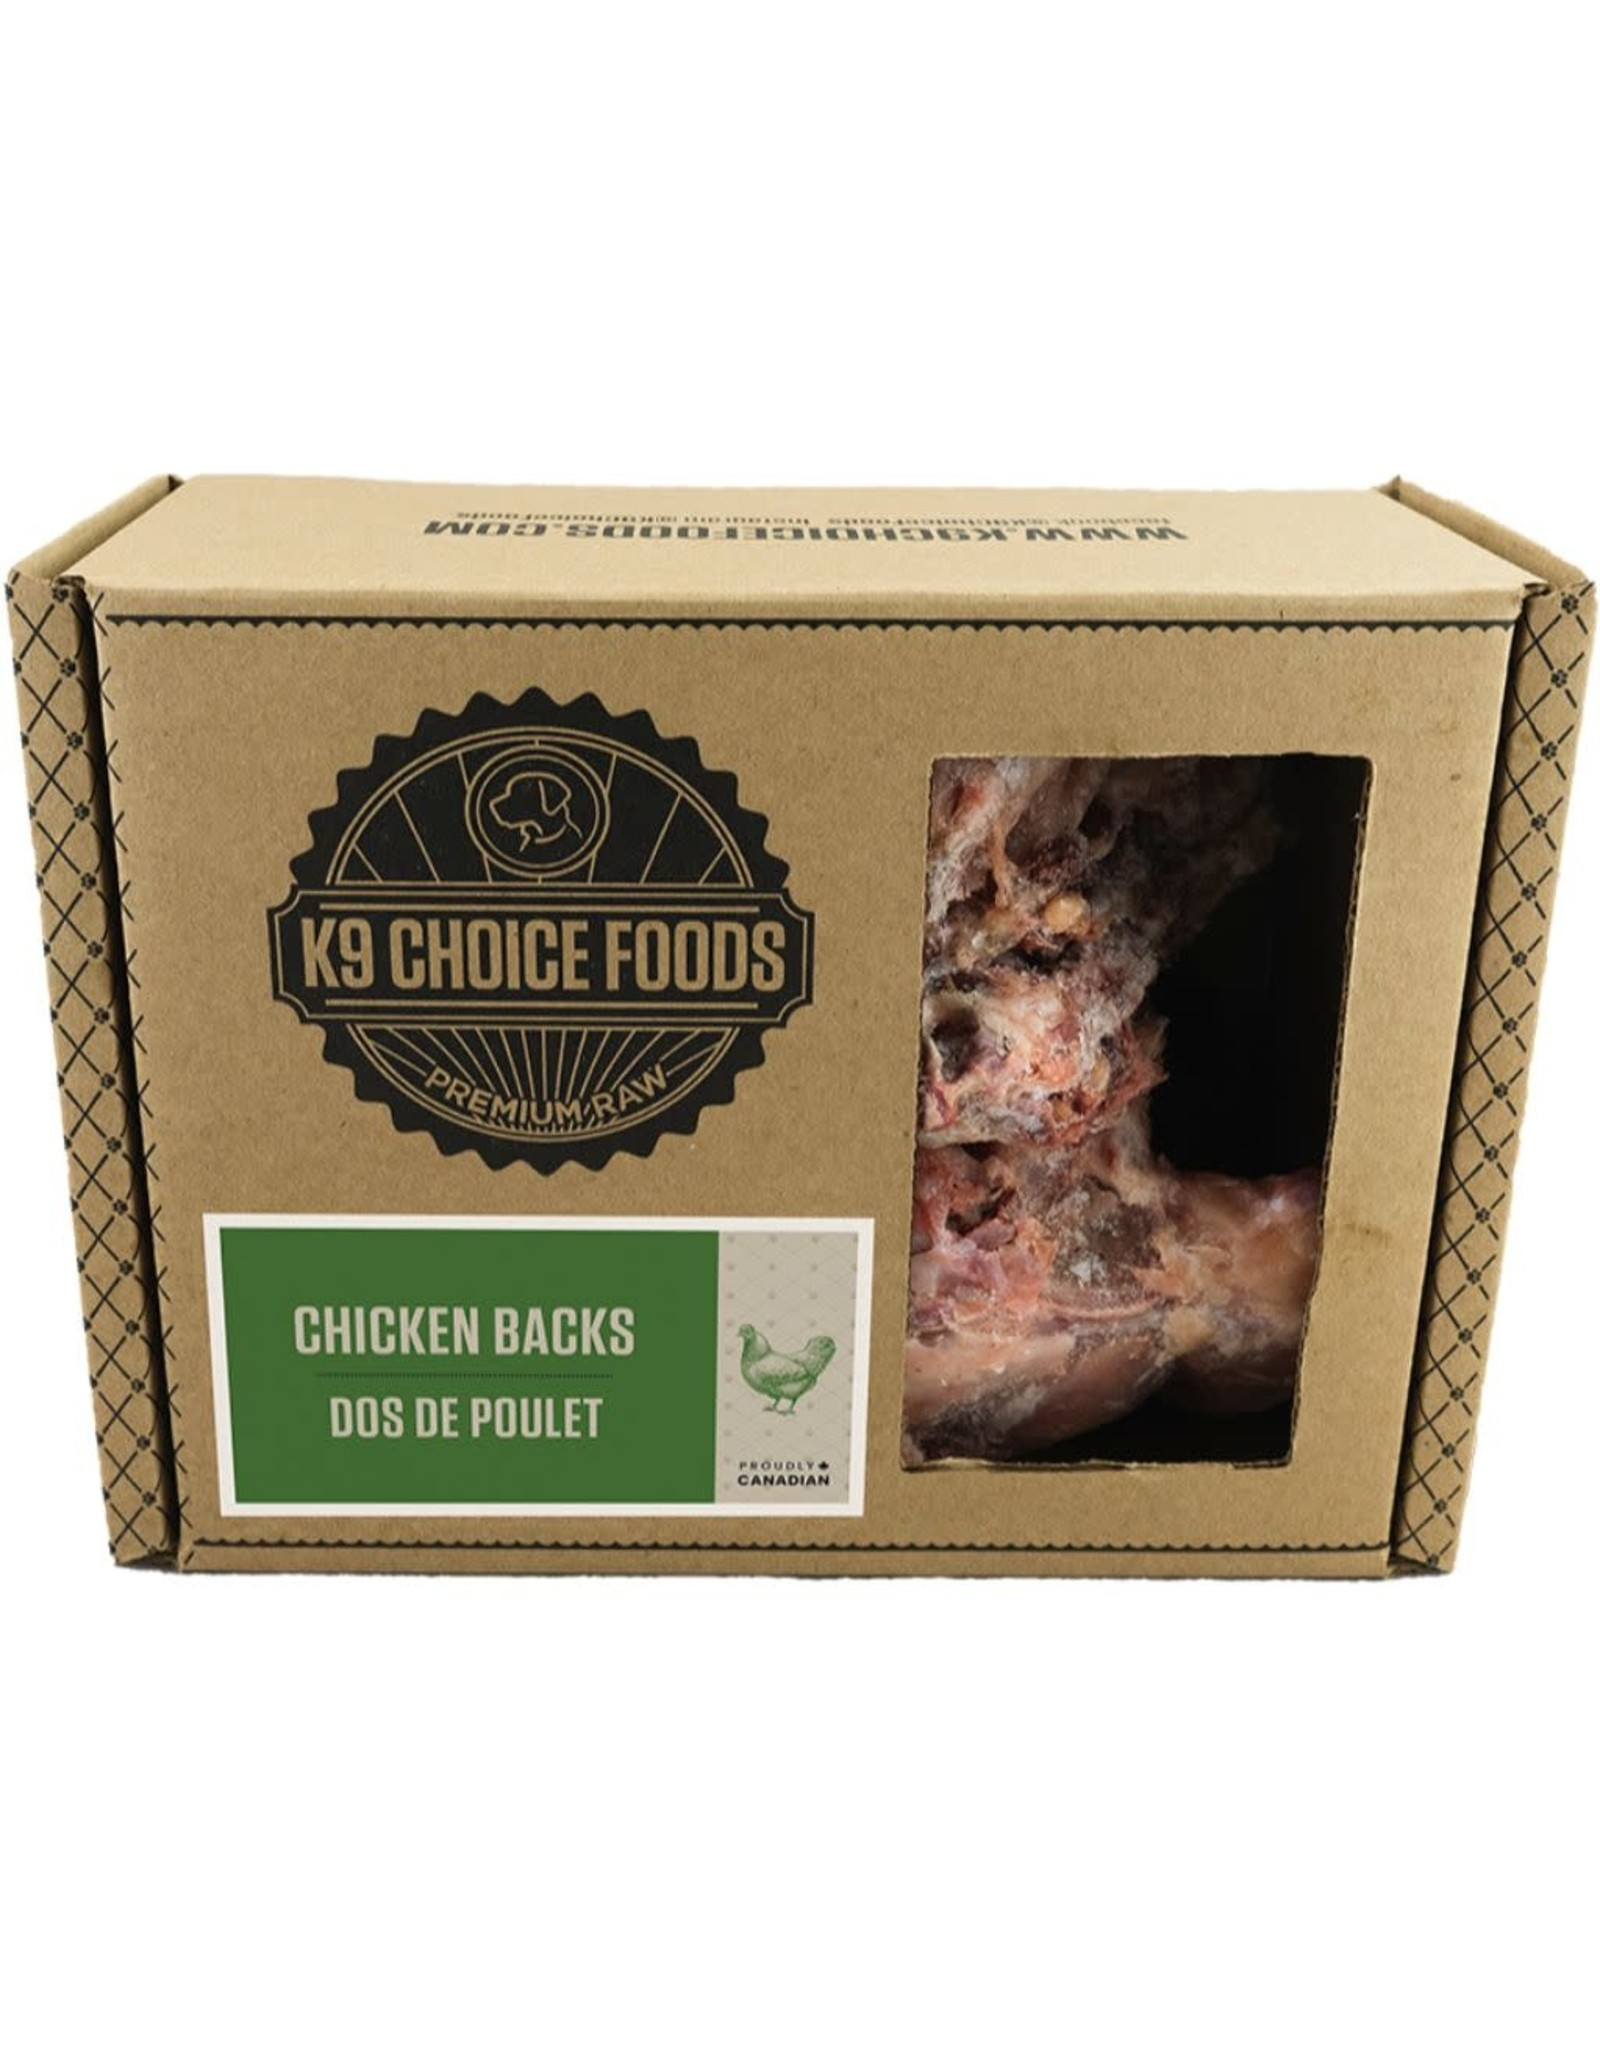 K9 Choice K9 Choice Frozen - Chicken Backs 2 LB